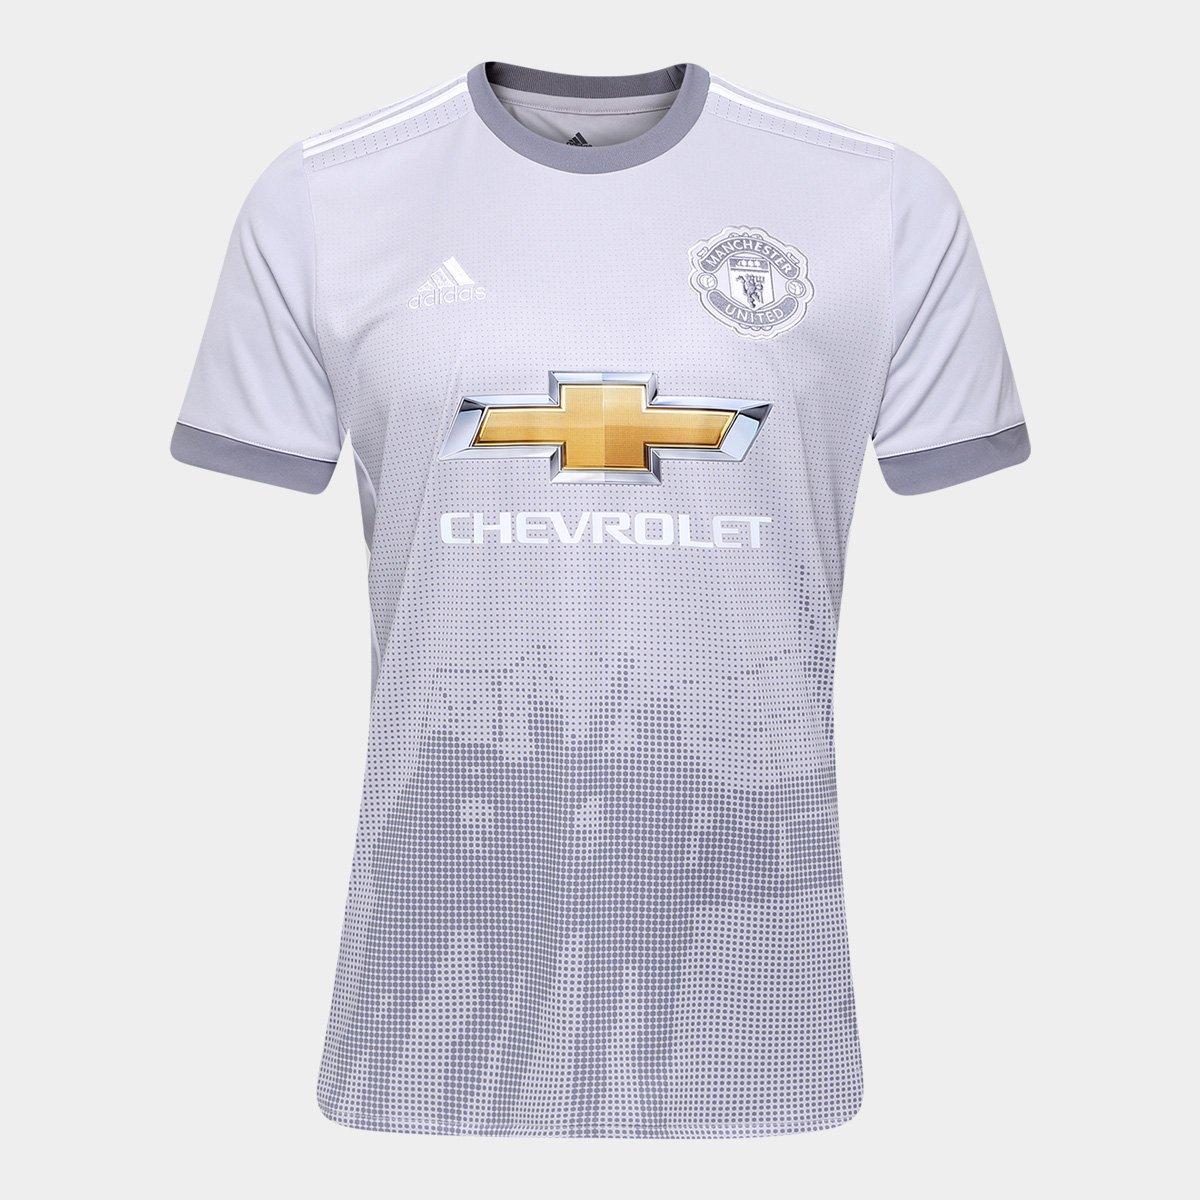 Camisa Manchester United Third 17 18 - S N Torcedor Adidas Masculina d0cbe729295d6